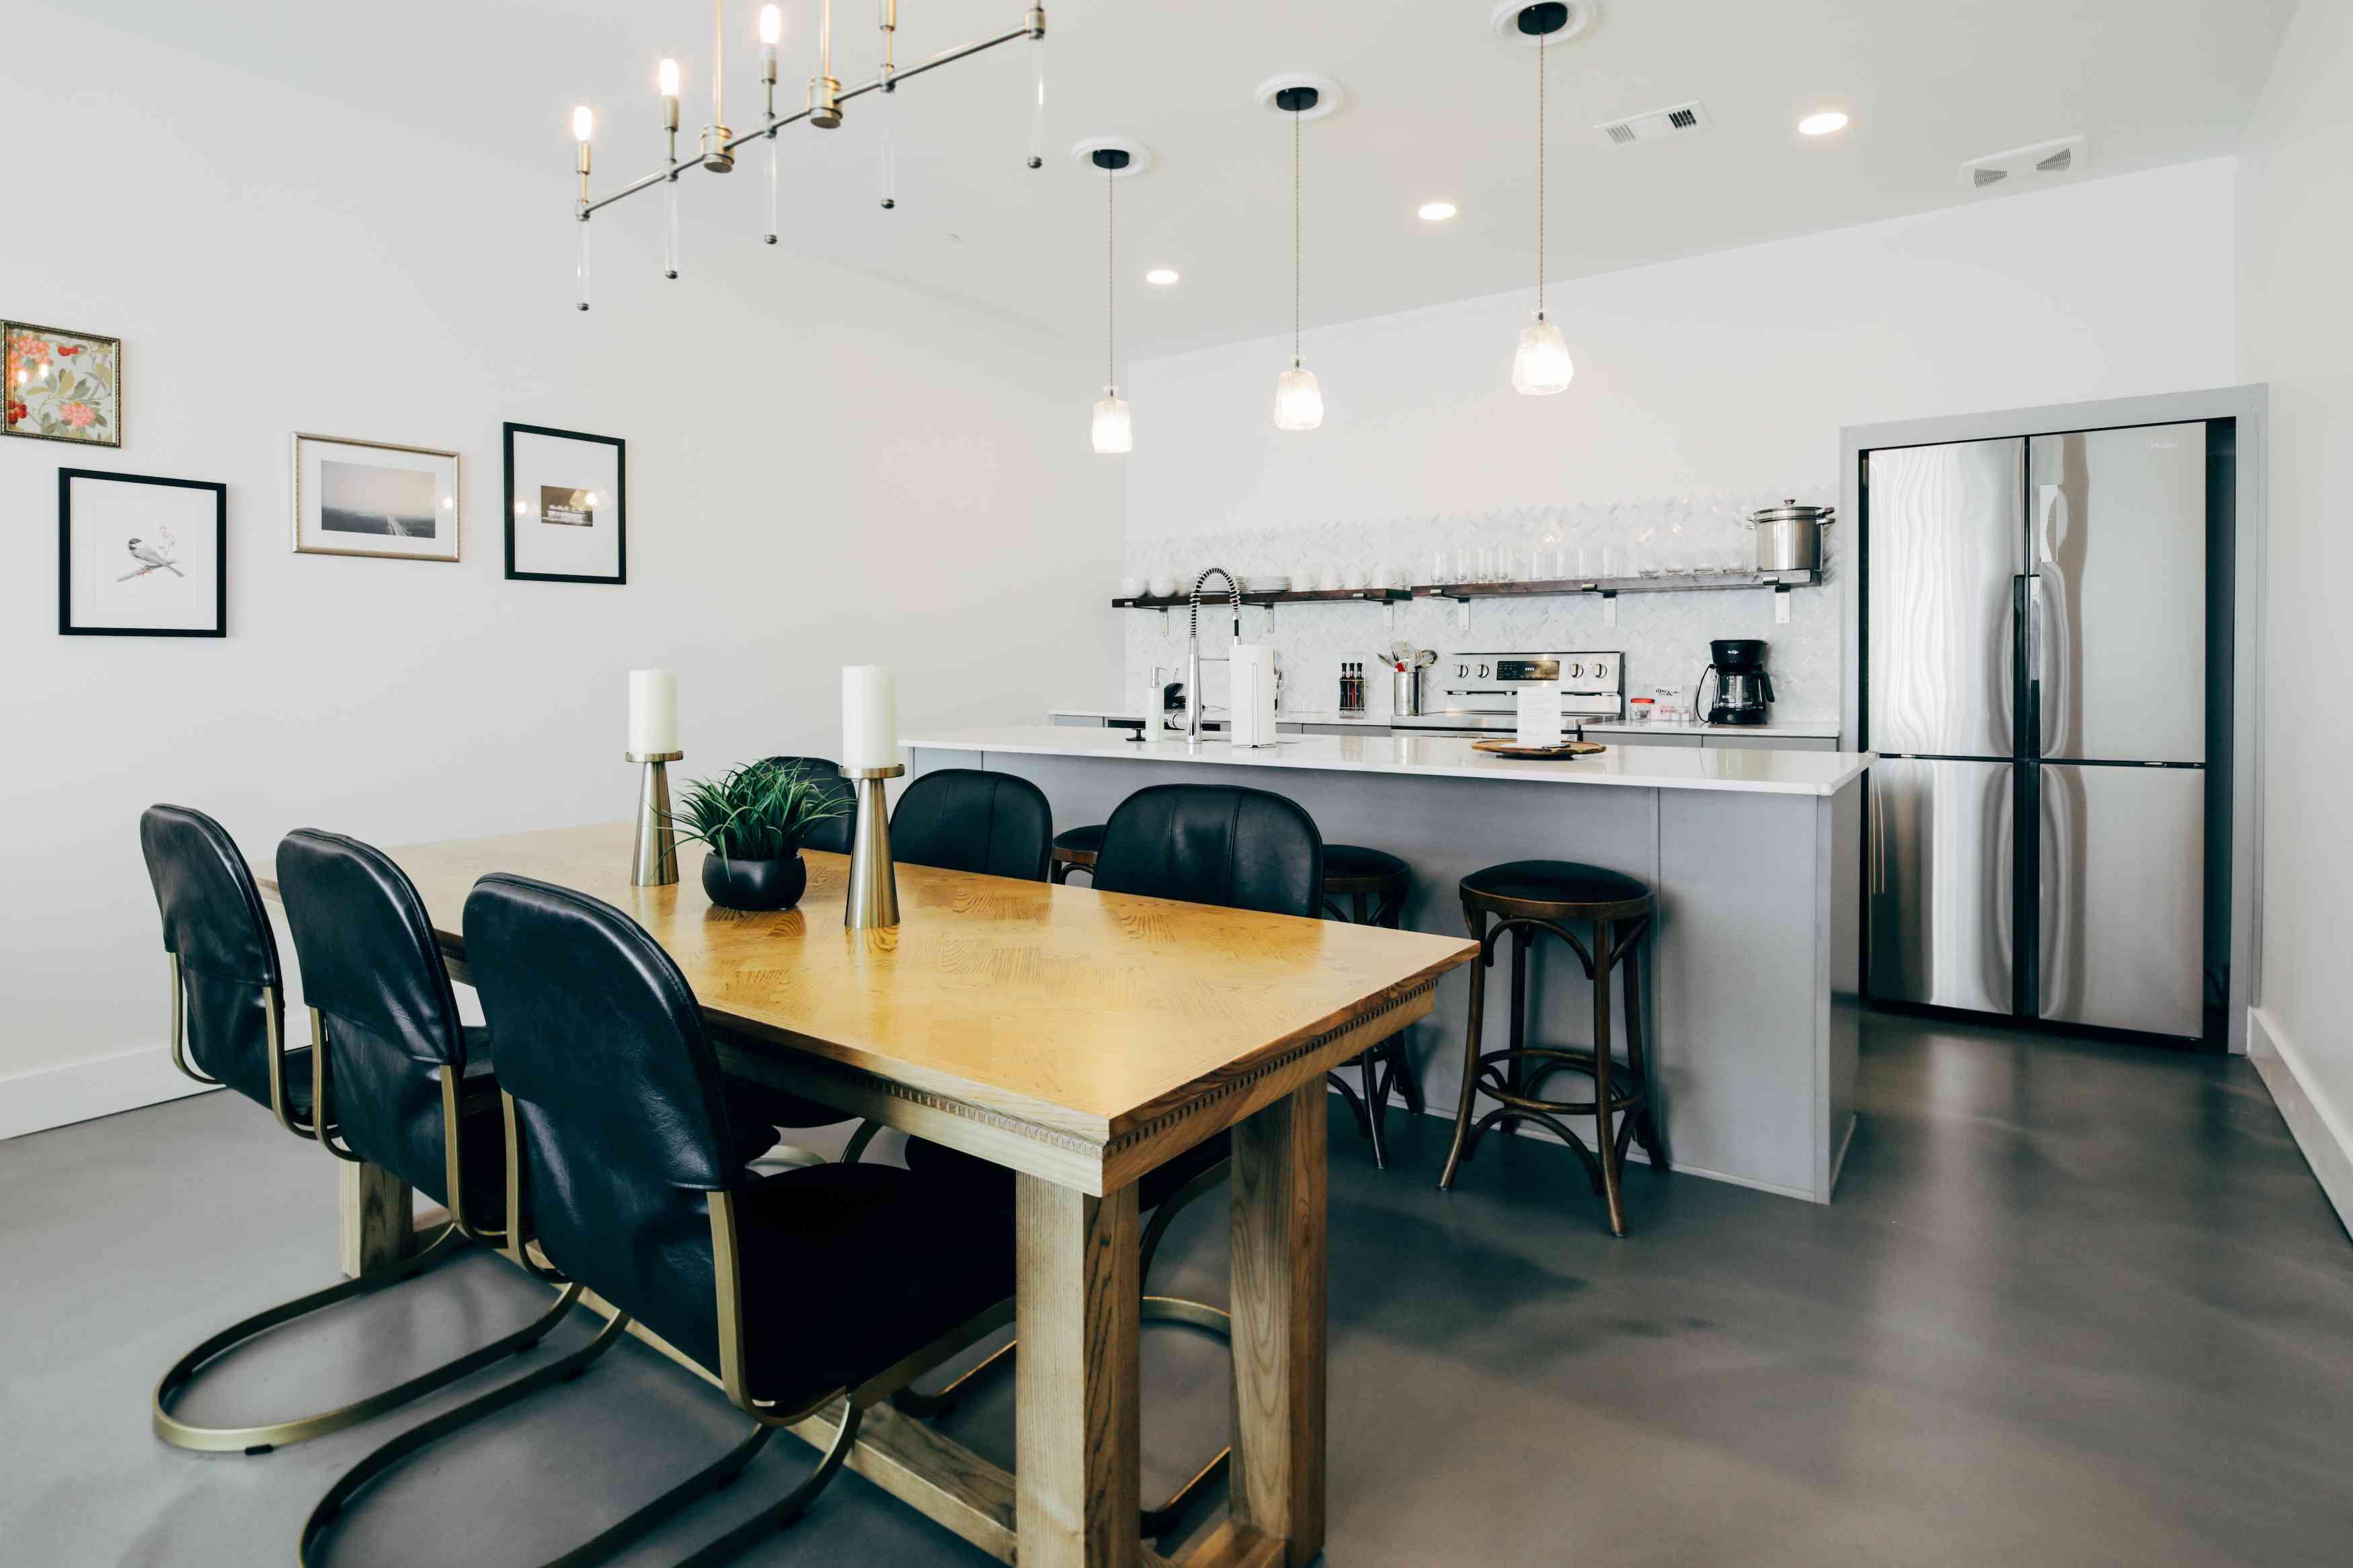 Colton House Hotel suite kitchen